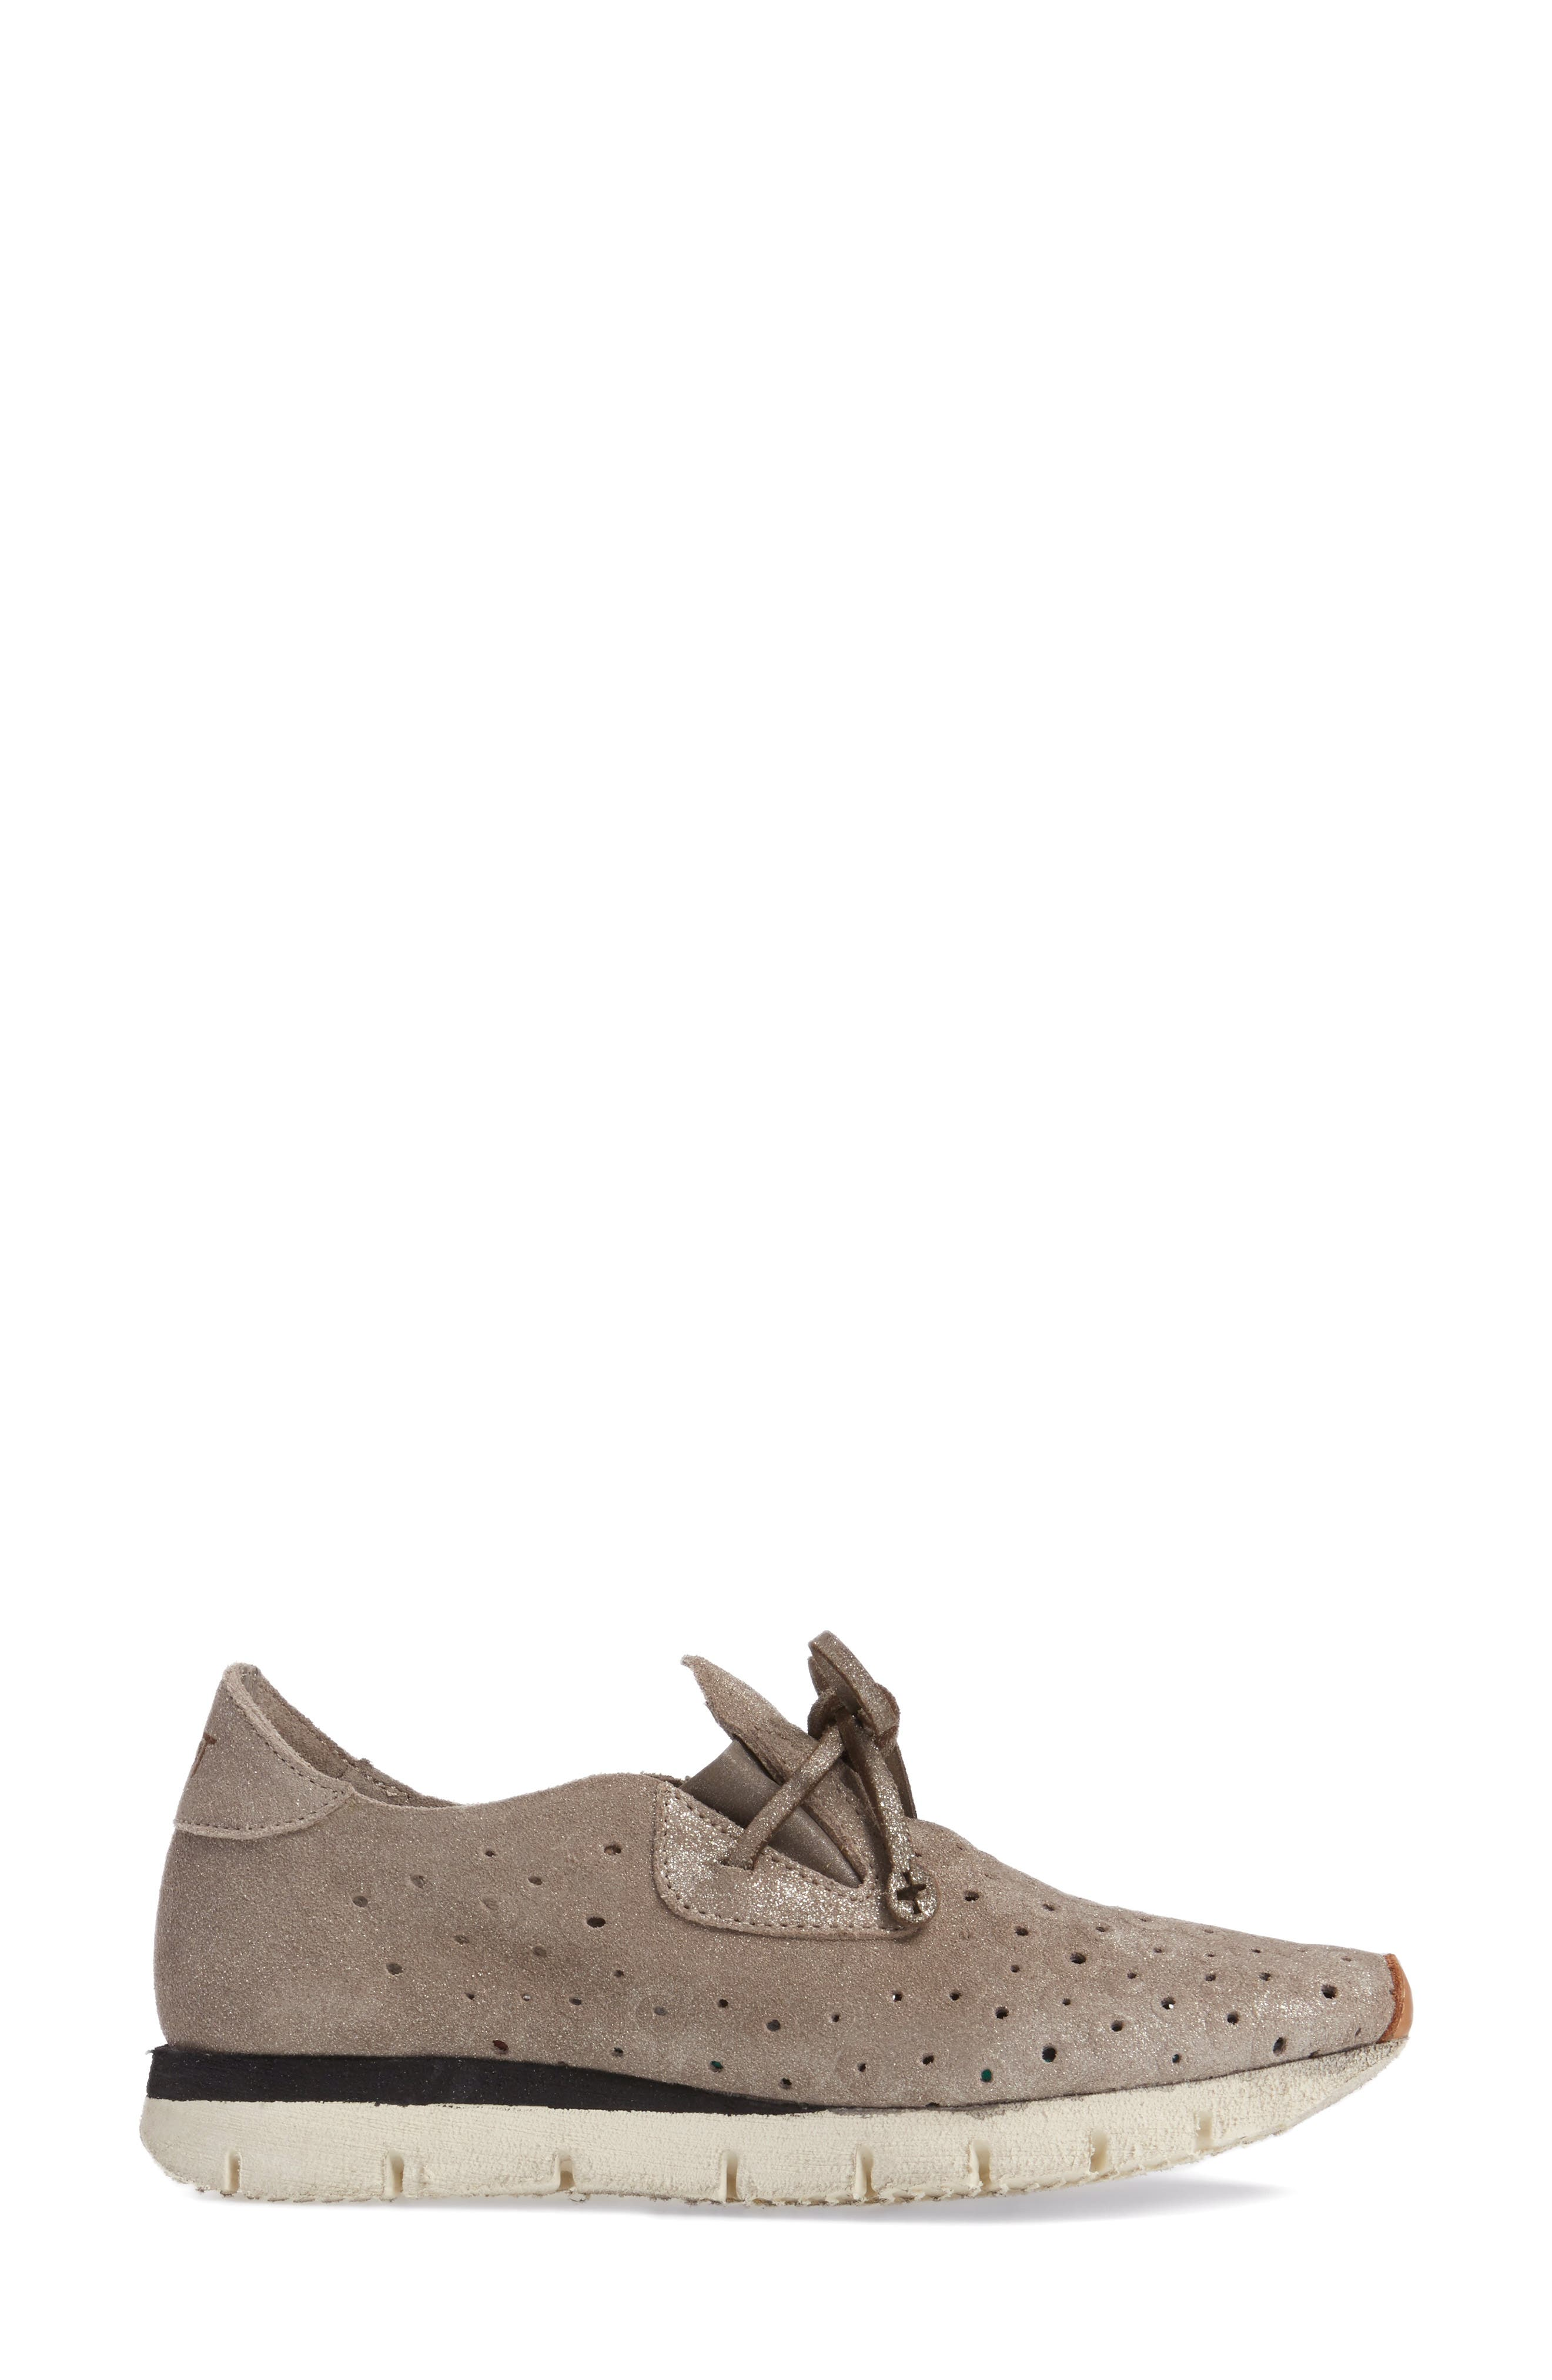 Alternate Image 3  - OTBT Lunar Sneaker (Women)